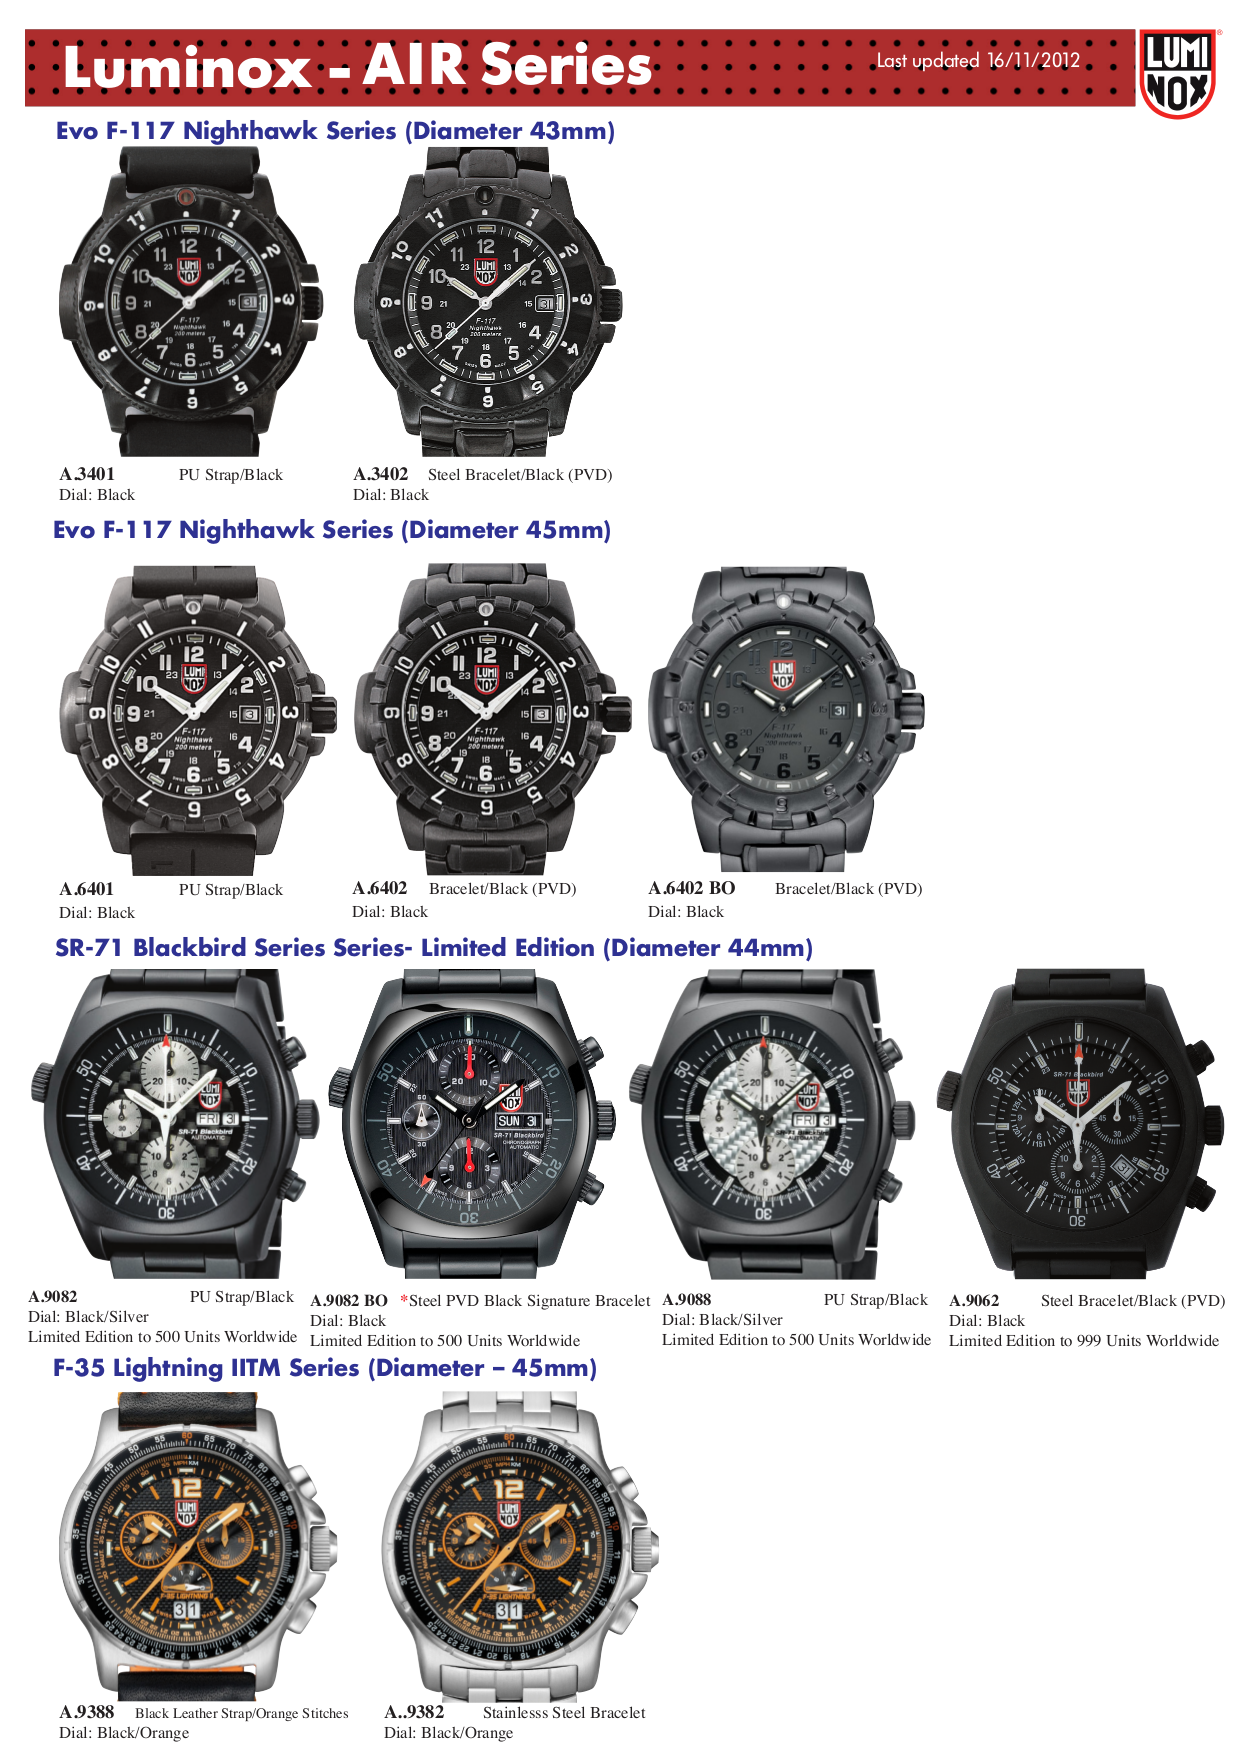 pdf for Luminox Watch EVO F-117 Nighthawk 6402 manual